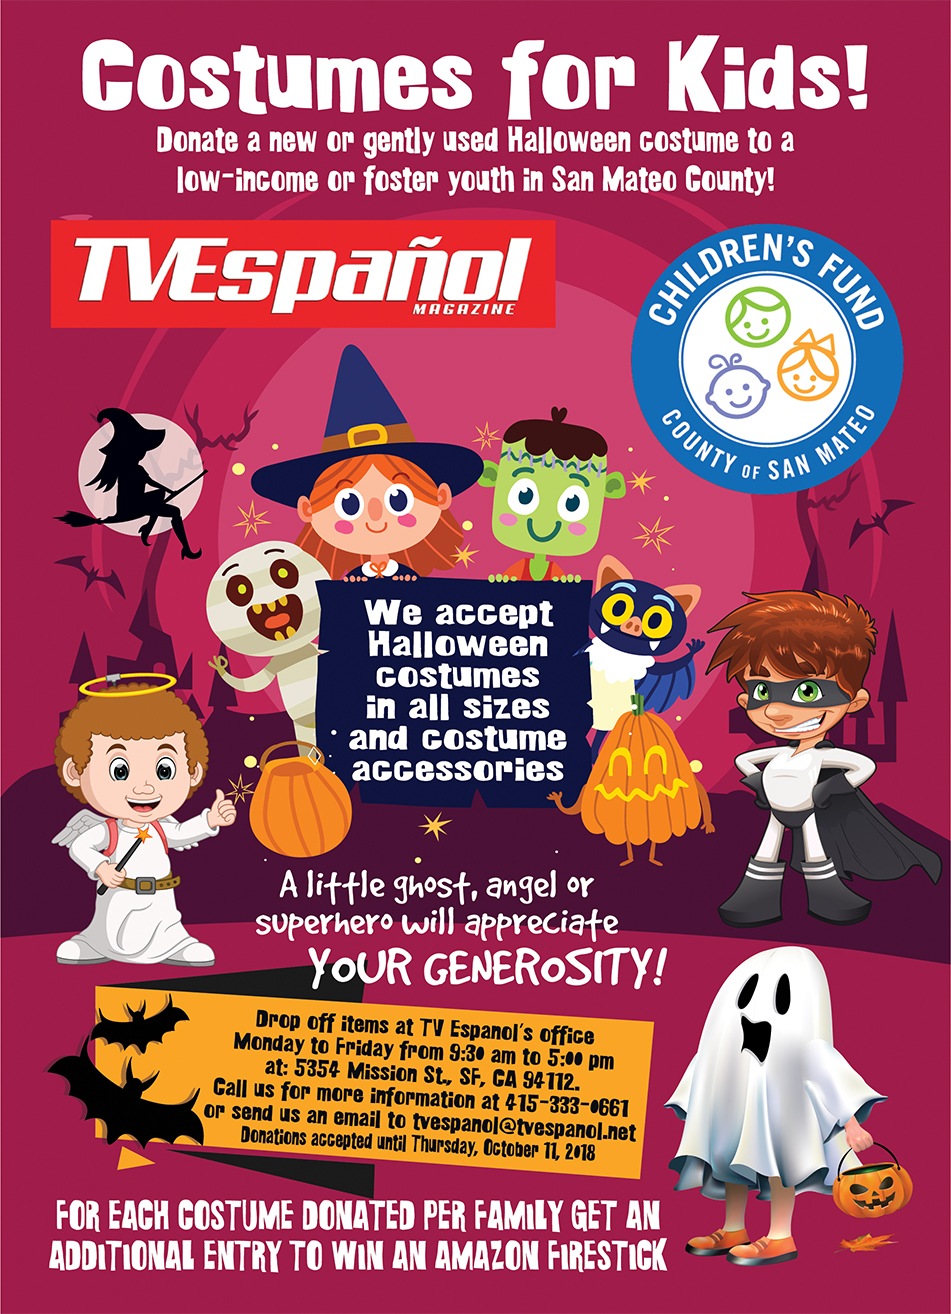 Halloween costumes -  Sept 2018 - INGLES-01 copy.jpg